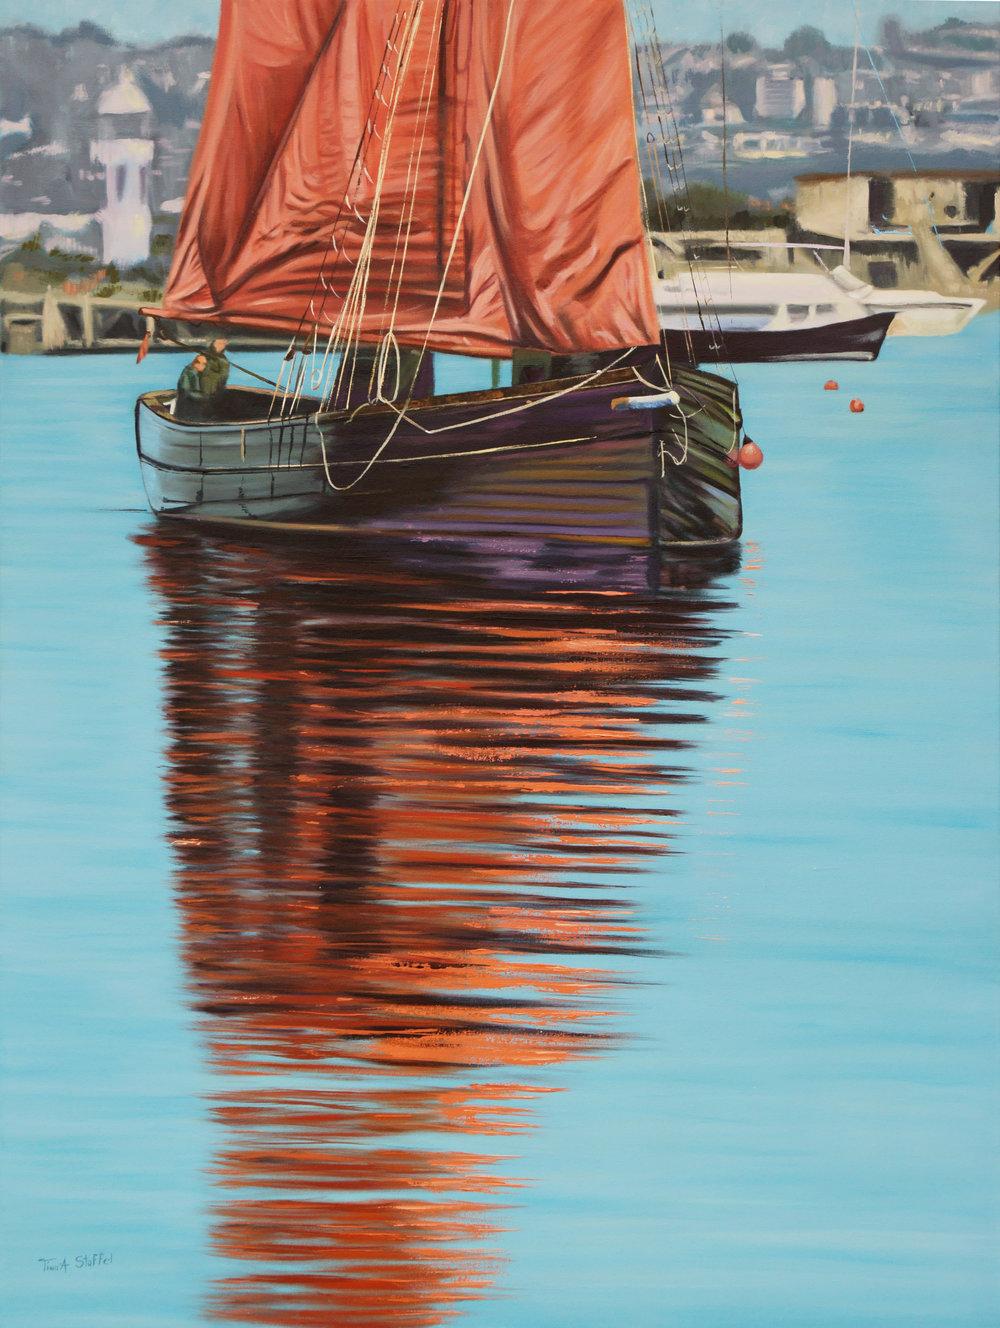 20496922-Mystery Ship painting by Tina A Stoffel hidden wm.jpg